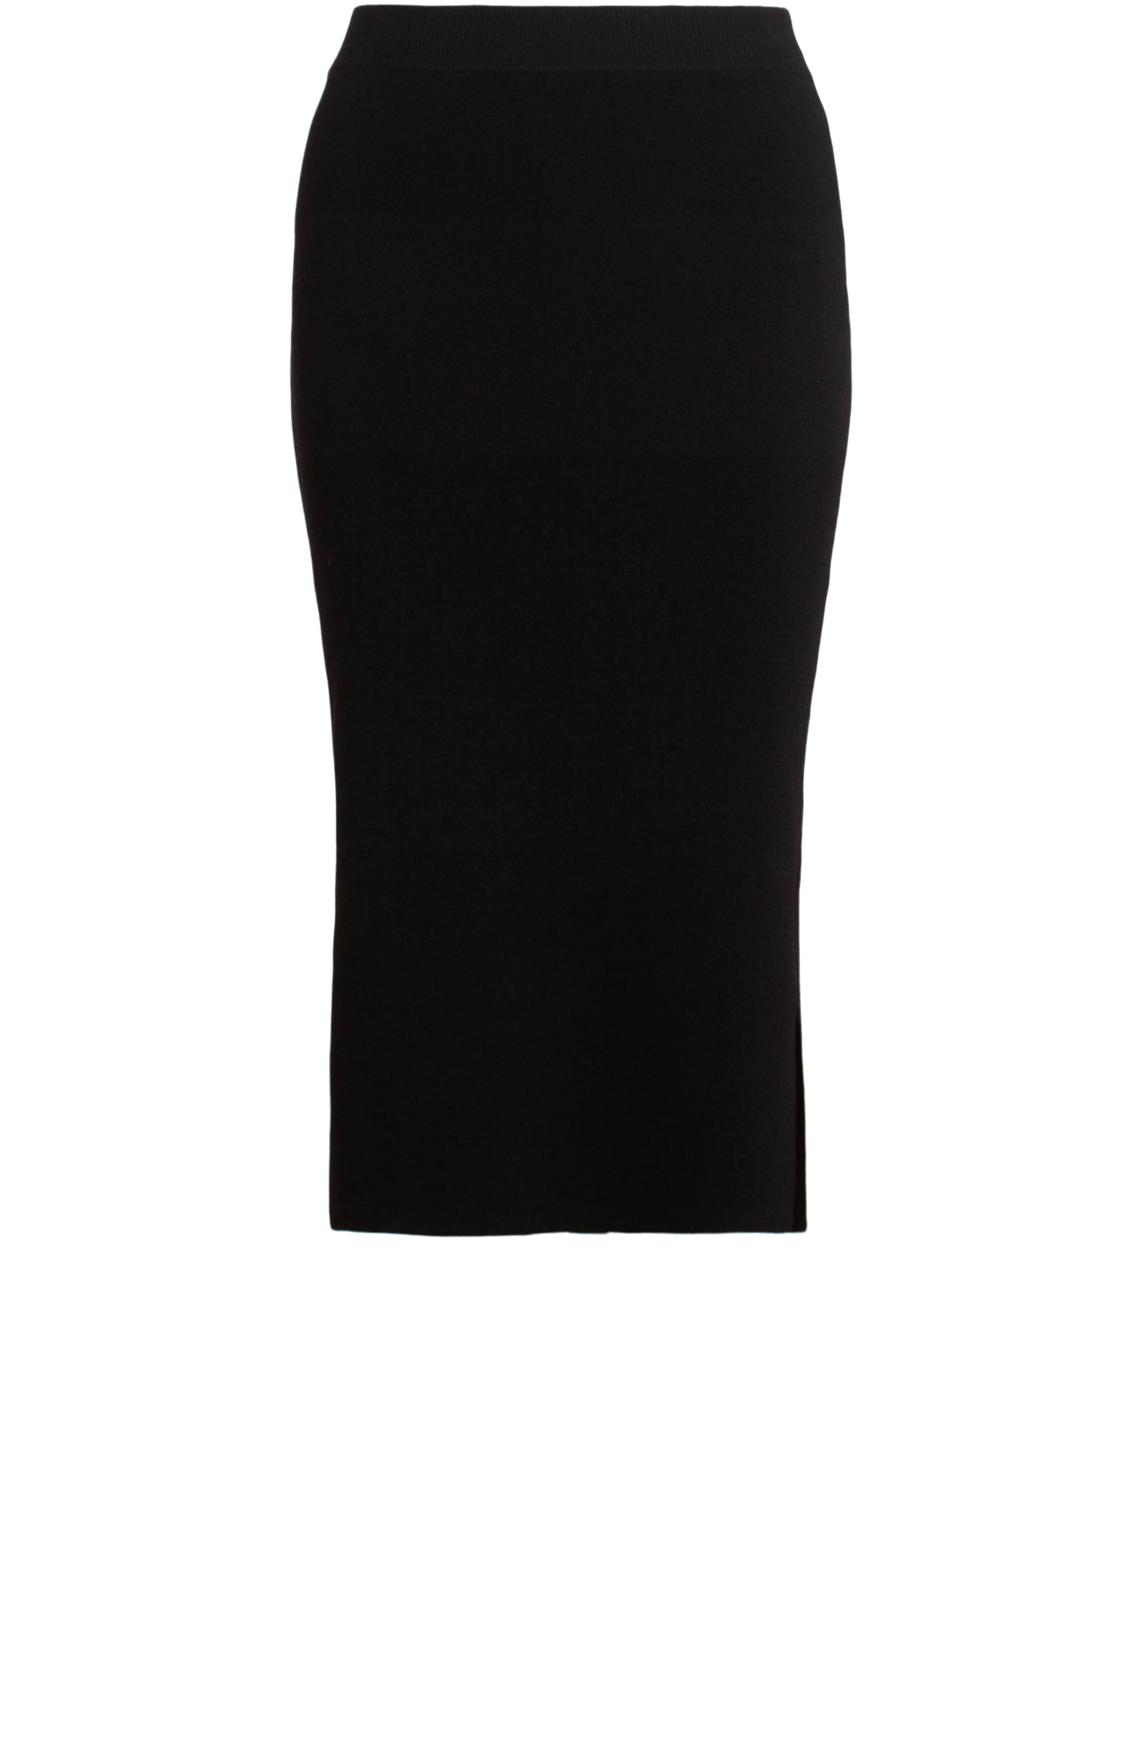 Anna Dames Midi rok met split zwart